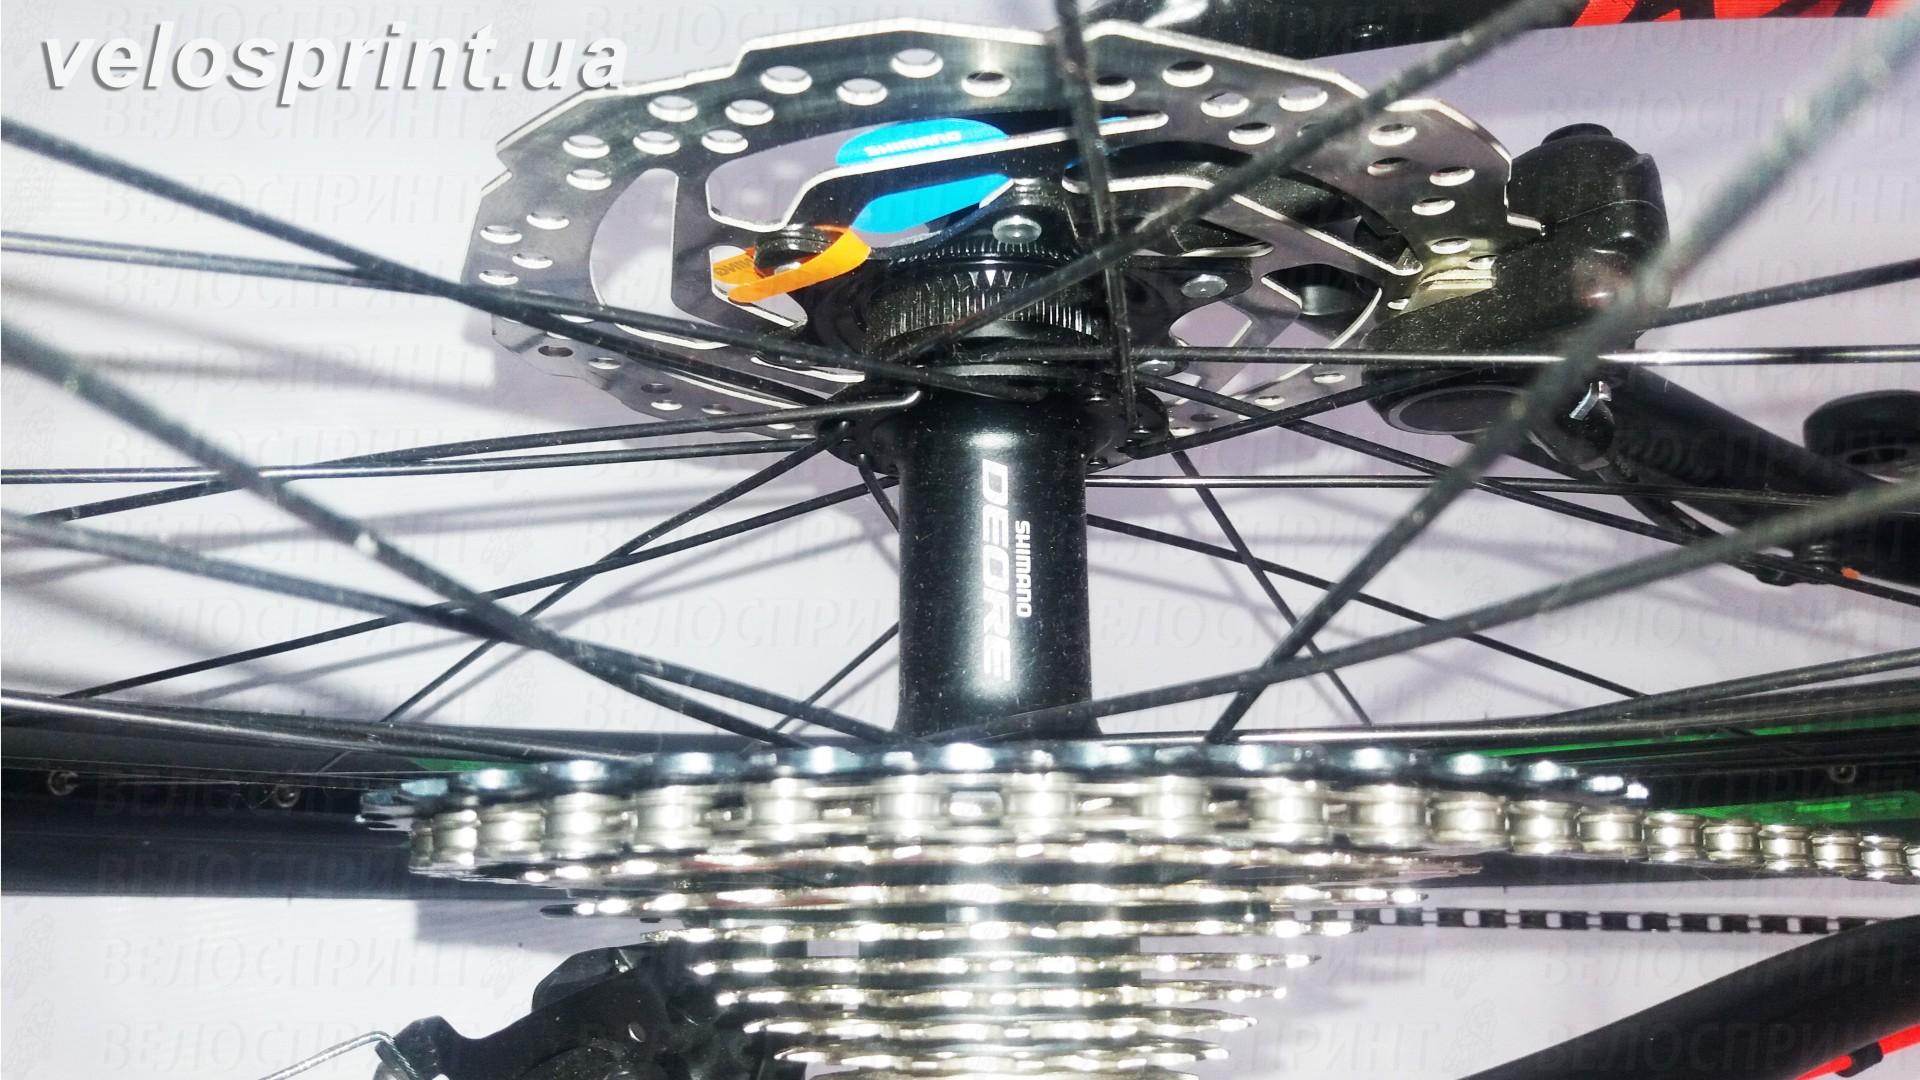 Велосипед GHOST Kato 7 AL 29 nightblack/riotgreen/neonred задняя втулка год 2017